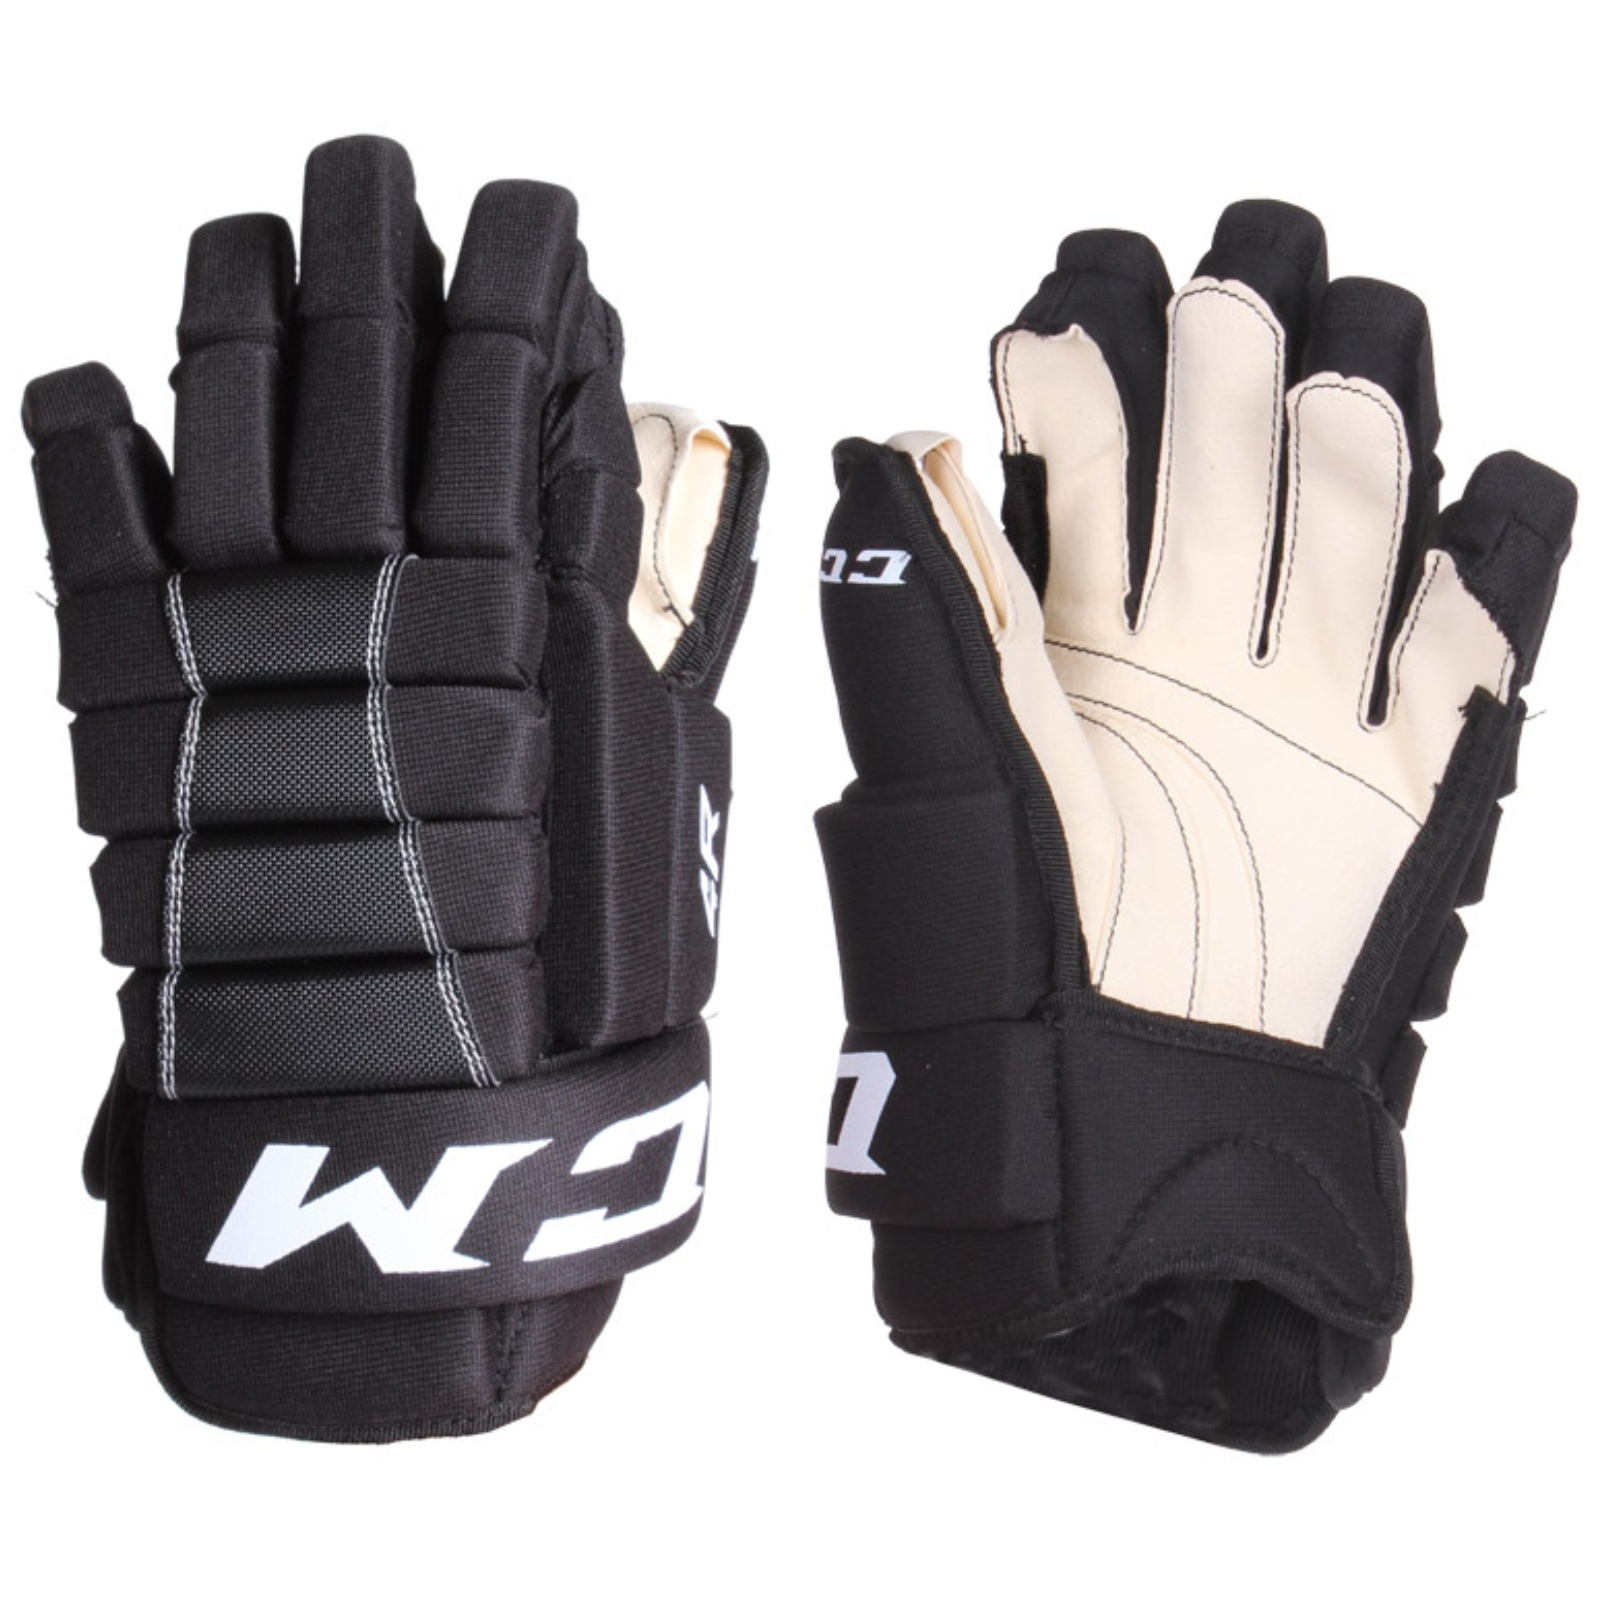 "Hokejové rukavice CCM 4R III senior, černo-bílé vel. 14"""